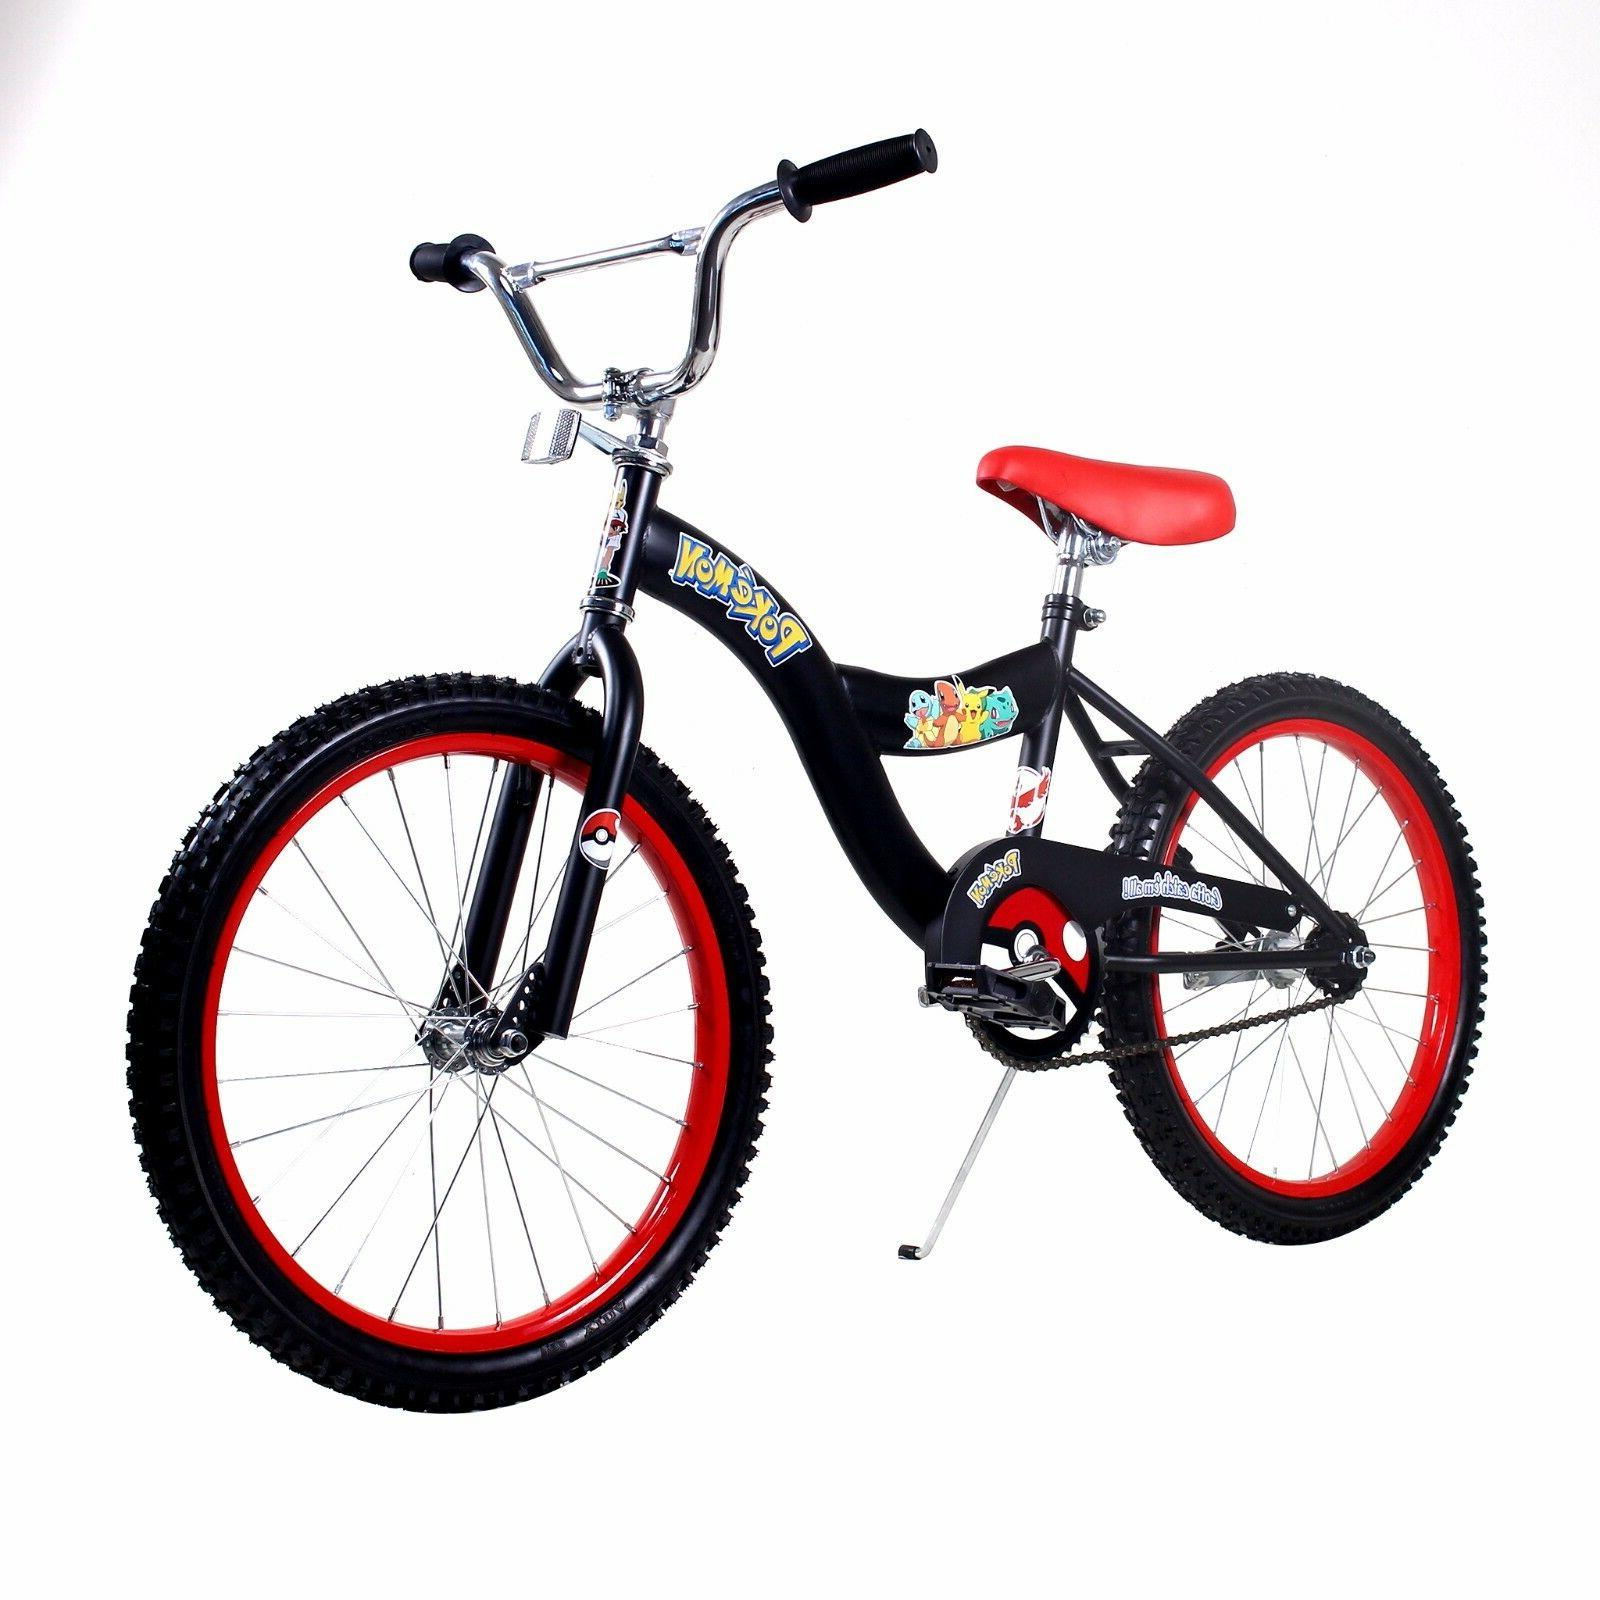 Pokemon bicycle boys kids size 16 inch bike black